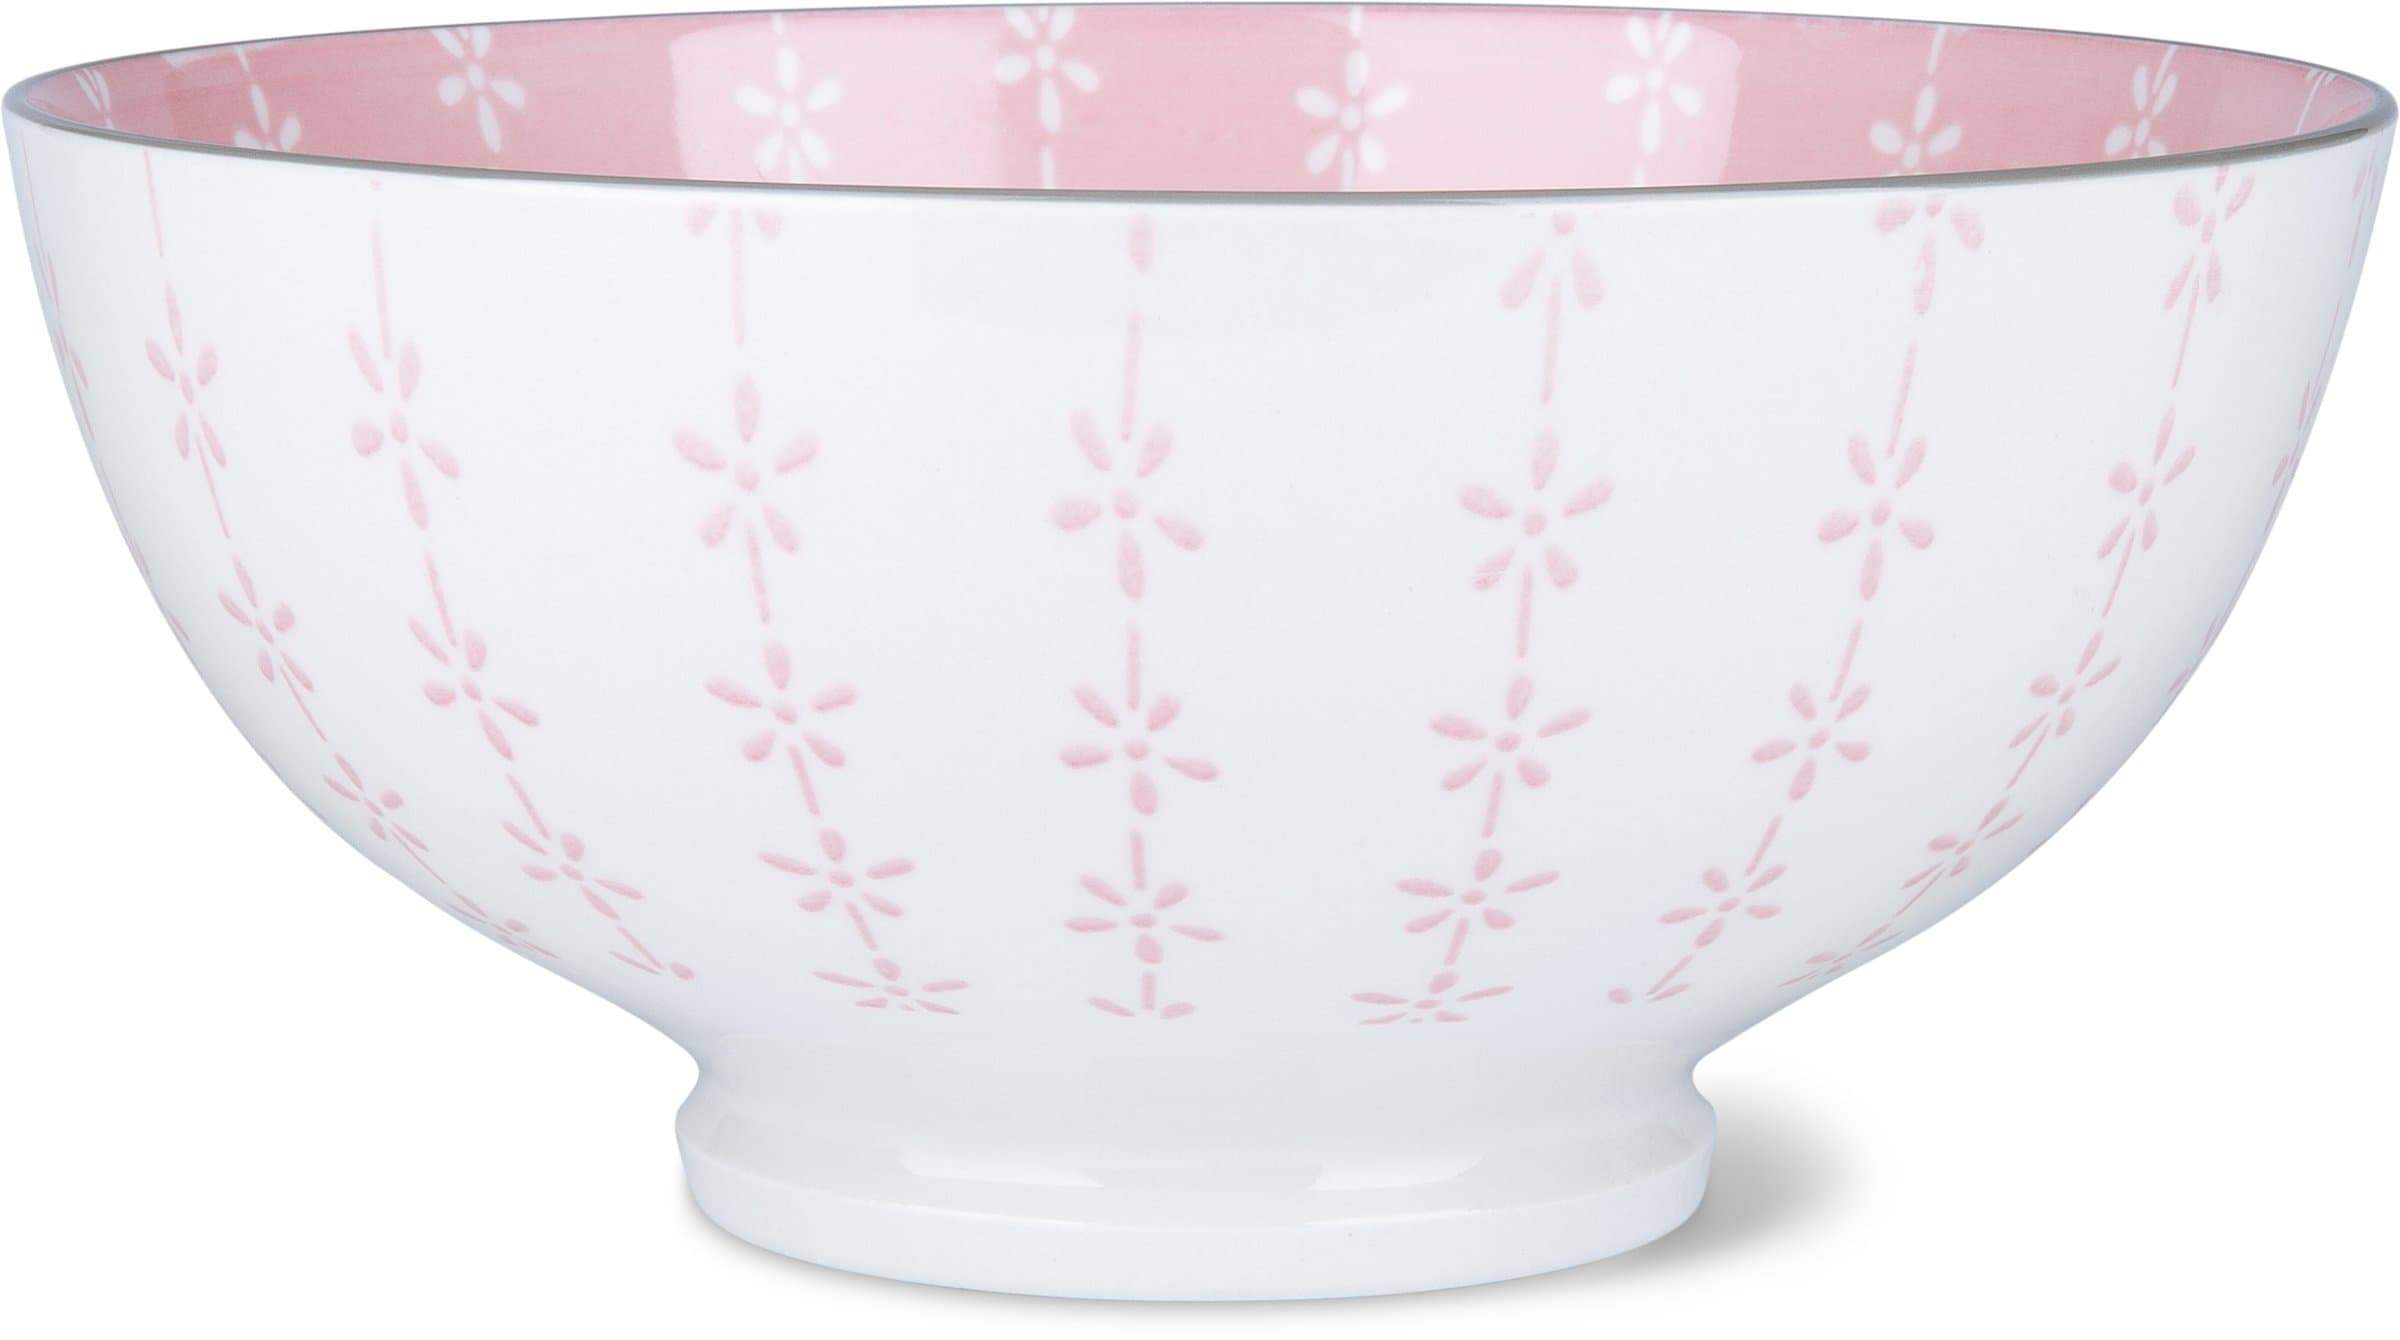 Cucina & Tavola Bowl gross